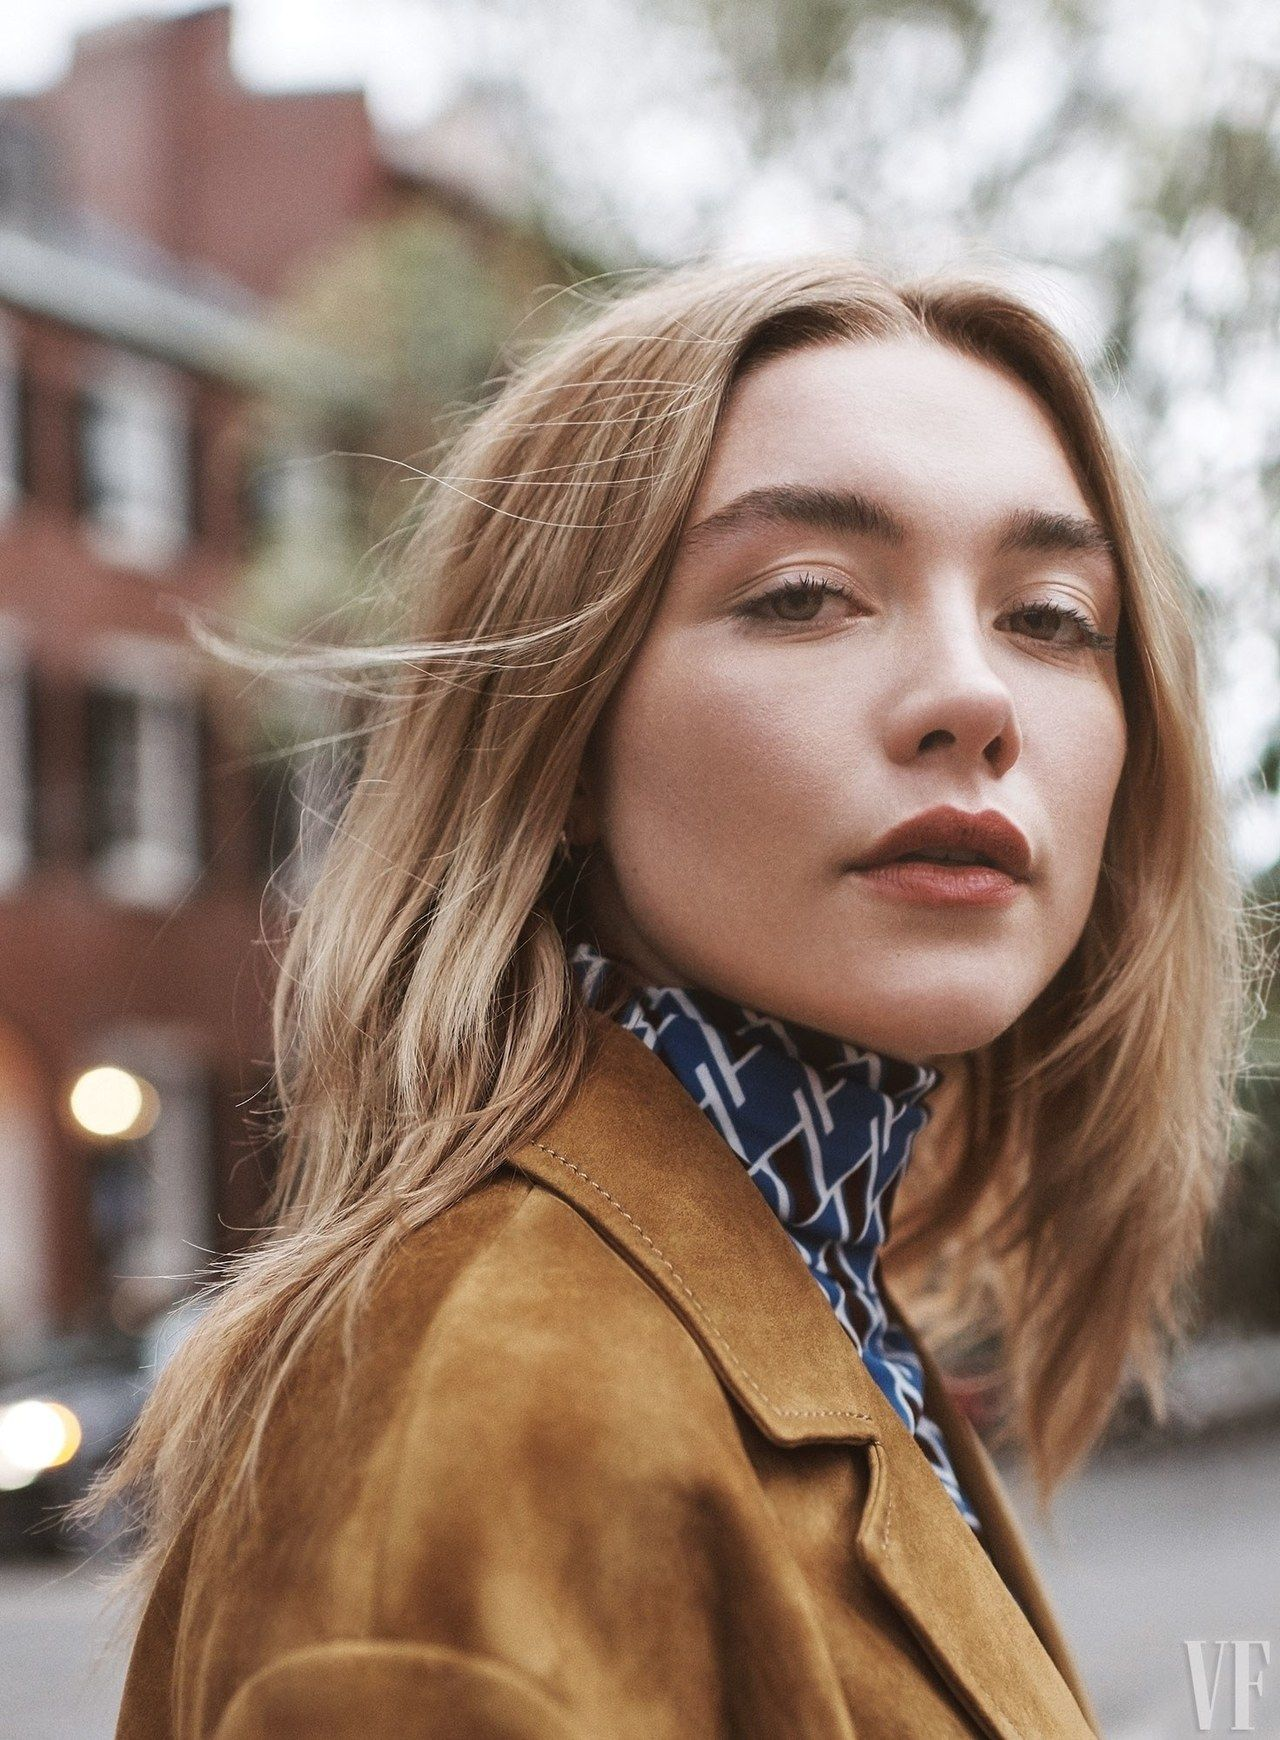 Florence Pugh Vanity Fair December 2018